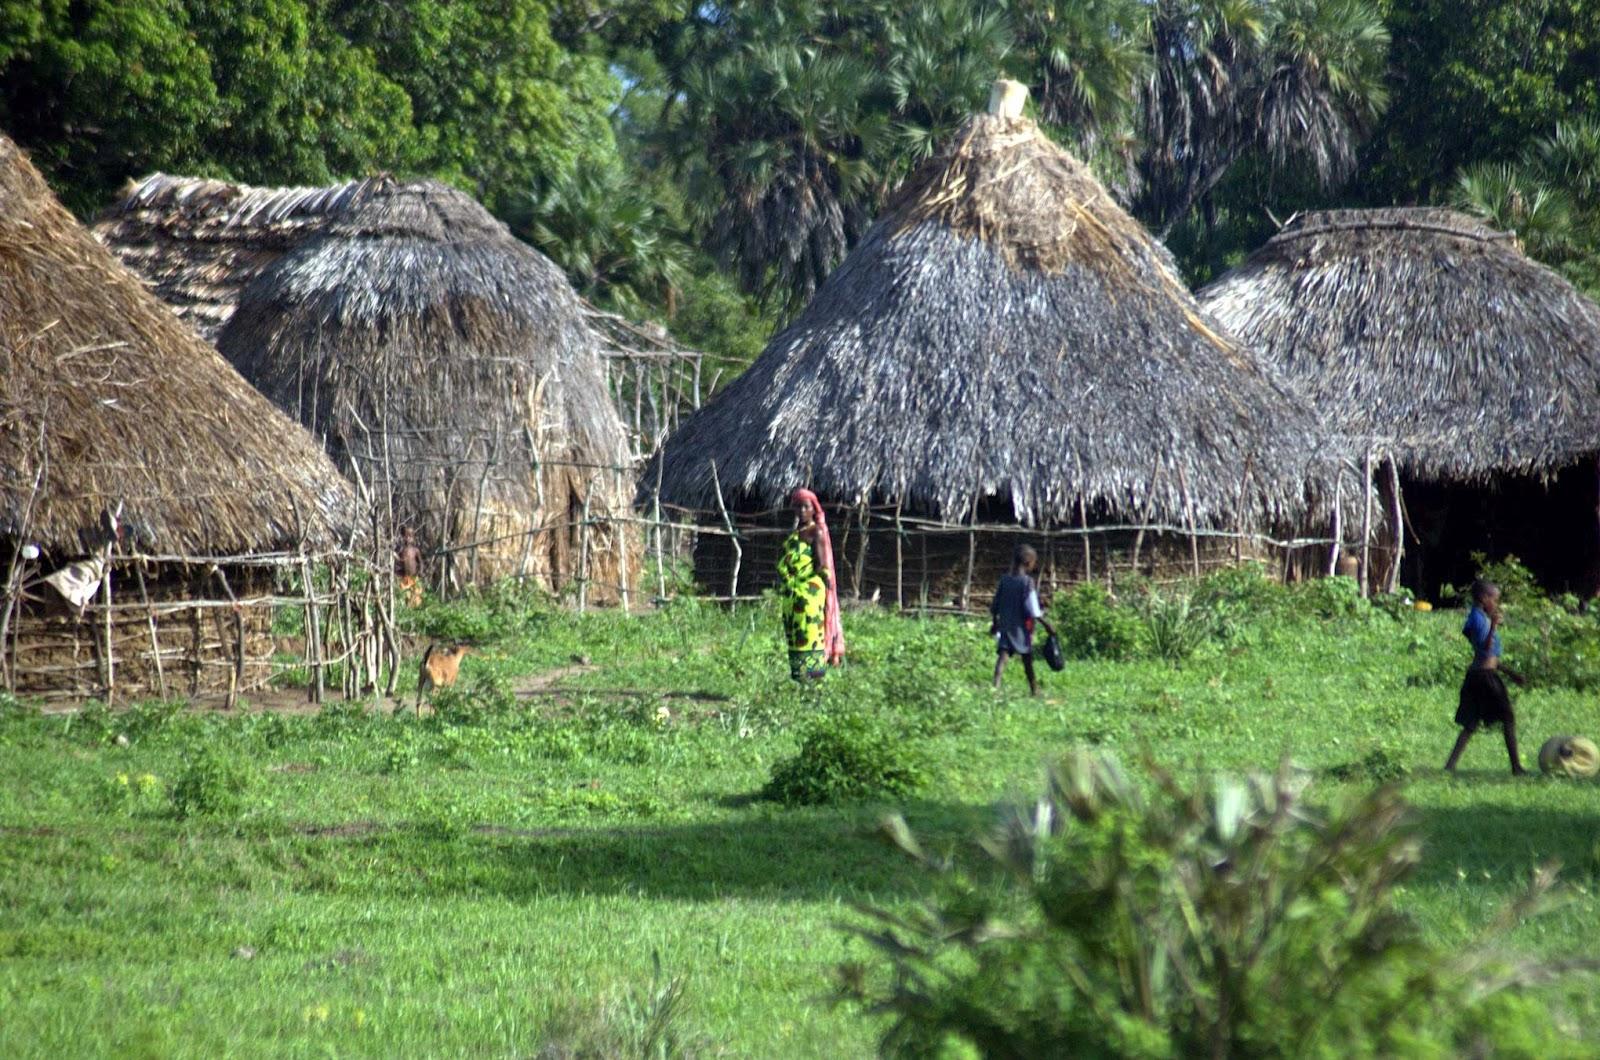 sacred-mijikenda-kaya-forests-kenya.jpg